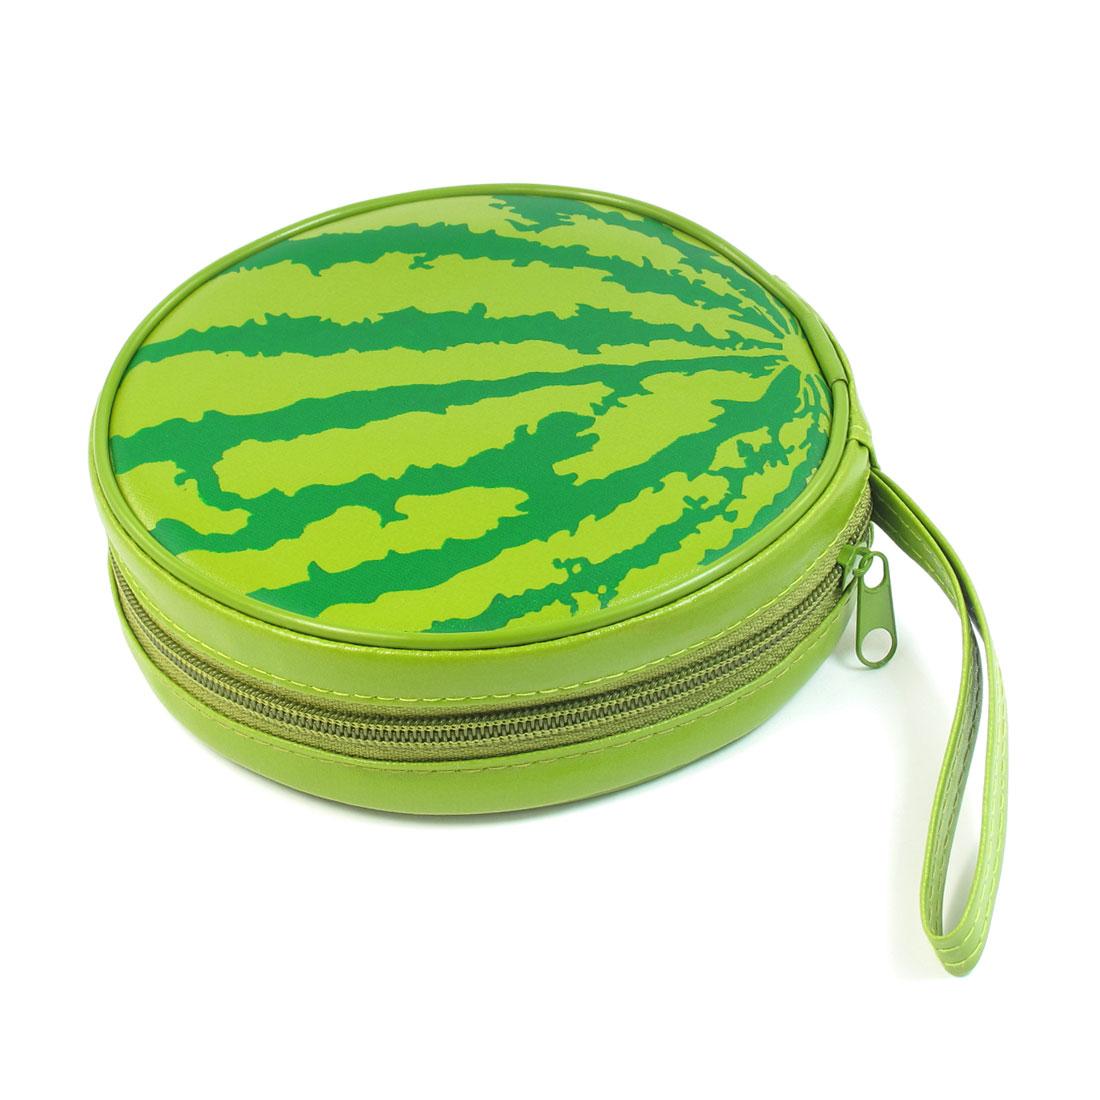 Green Watermelon Pattern 24 Capacity CD DVD Round Wallet Case Holder